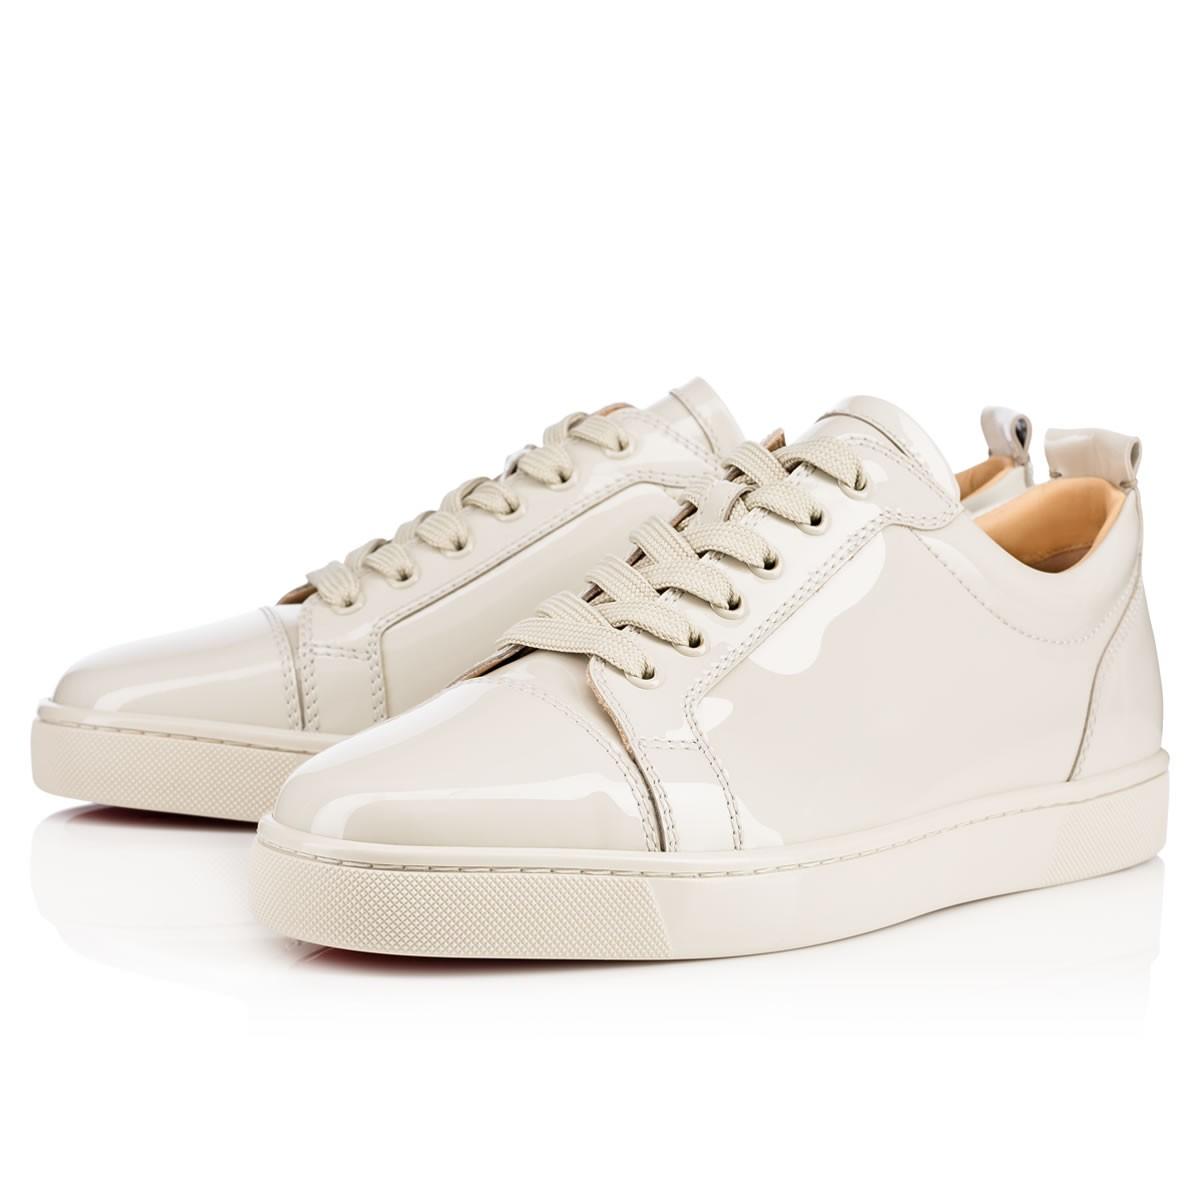 mens shoes christian louboutin